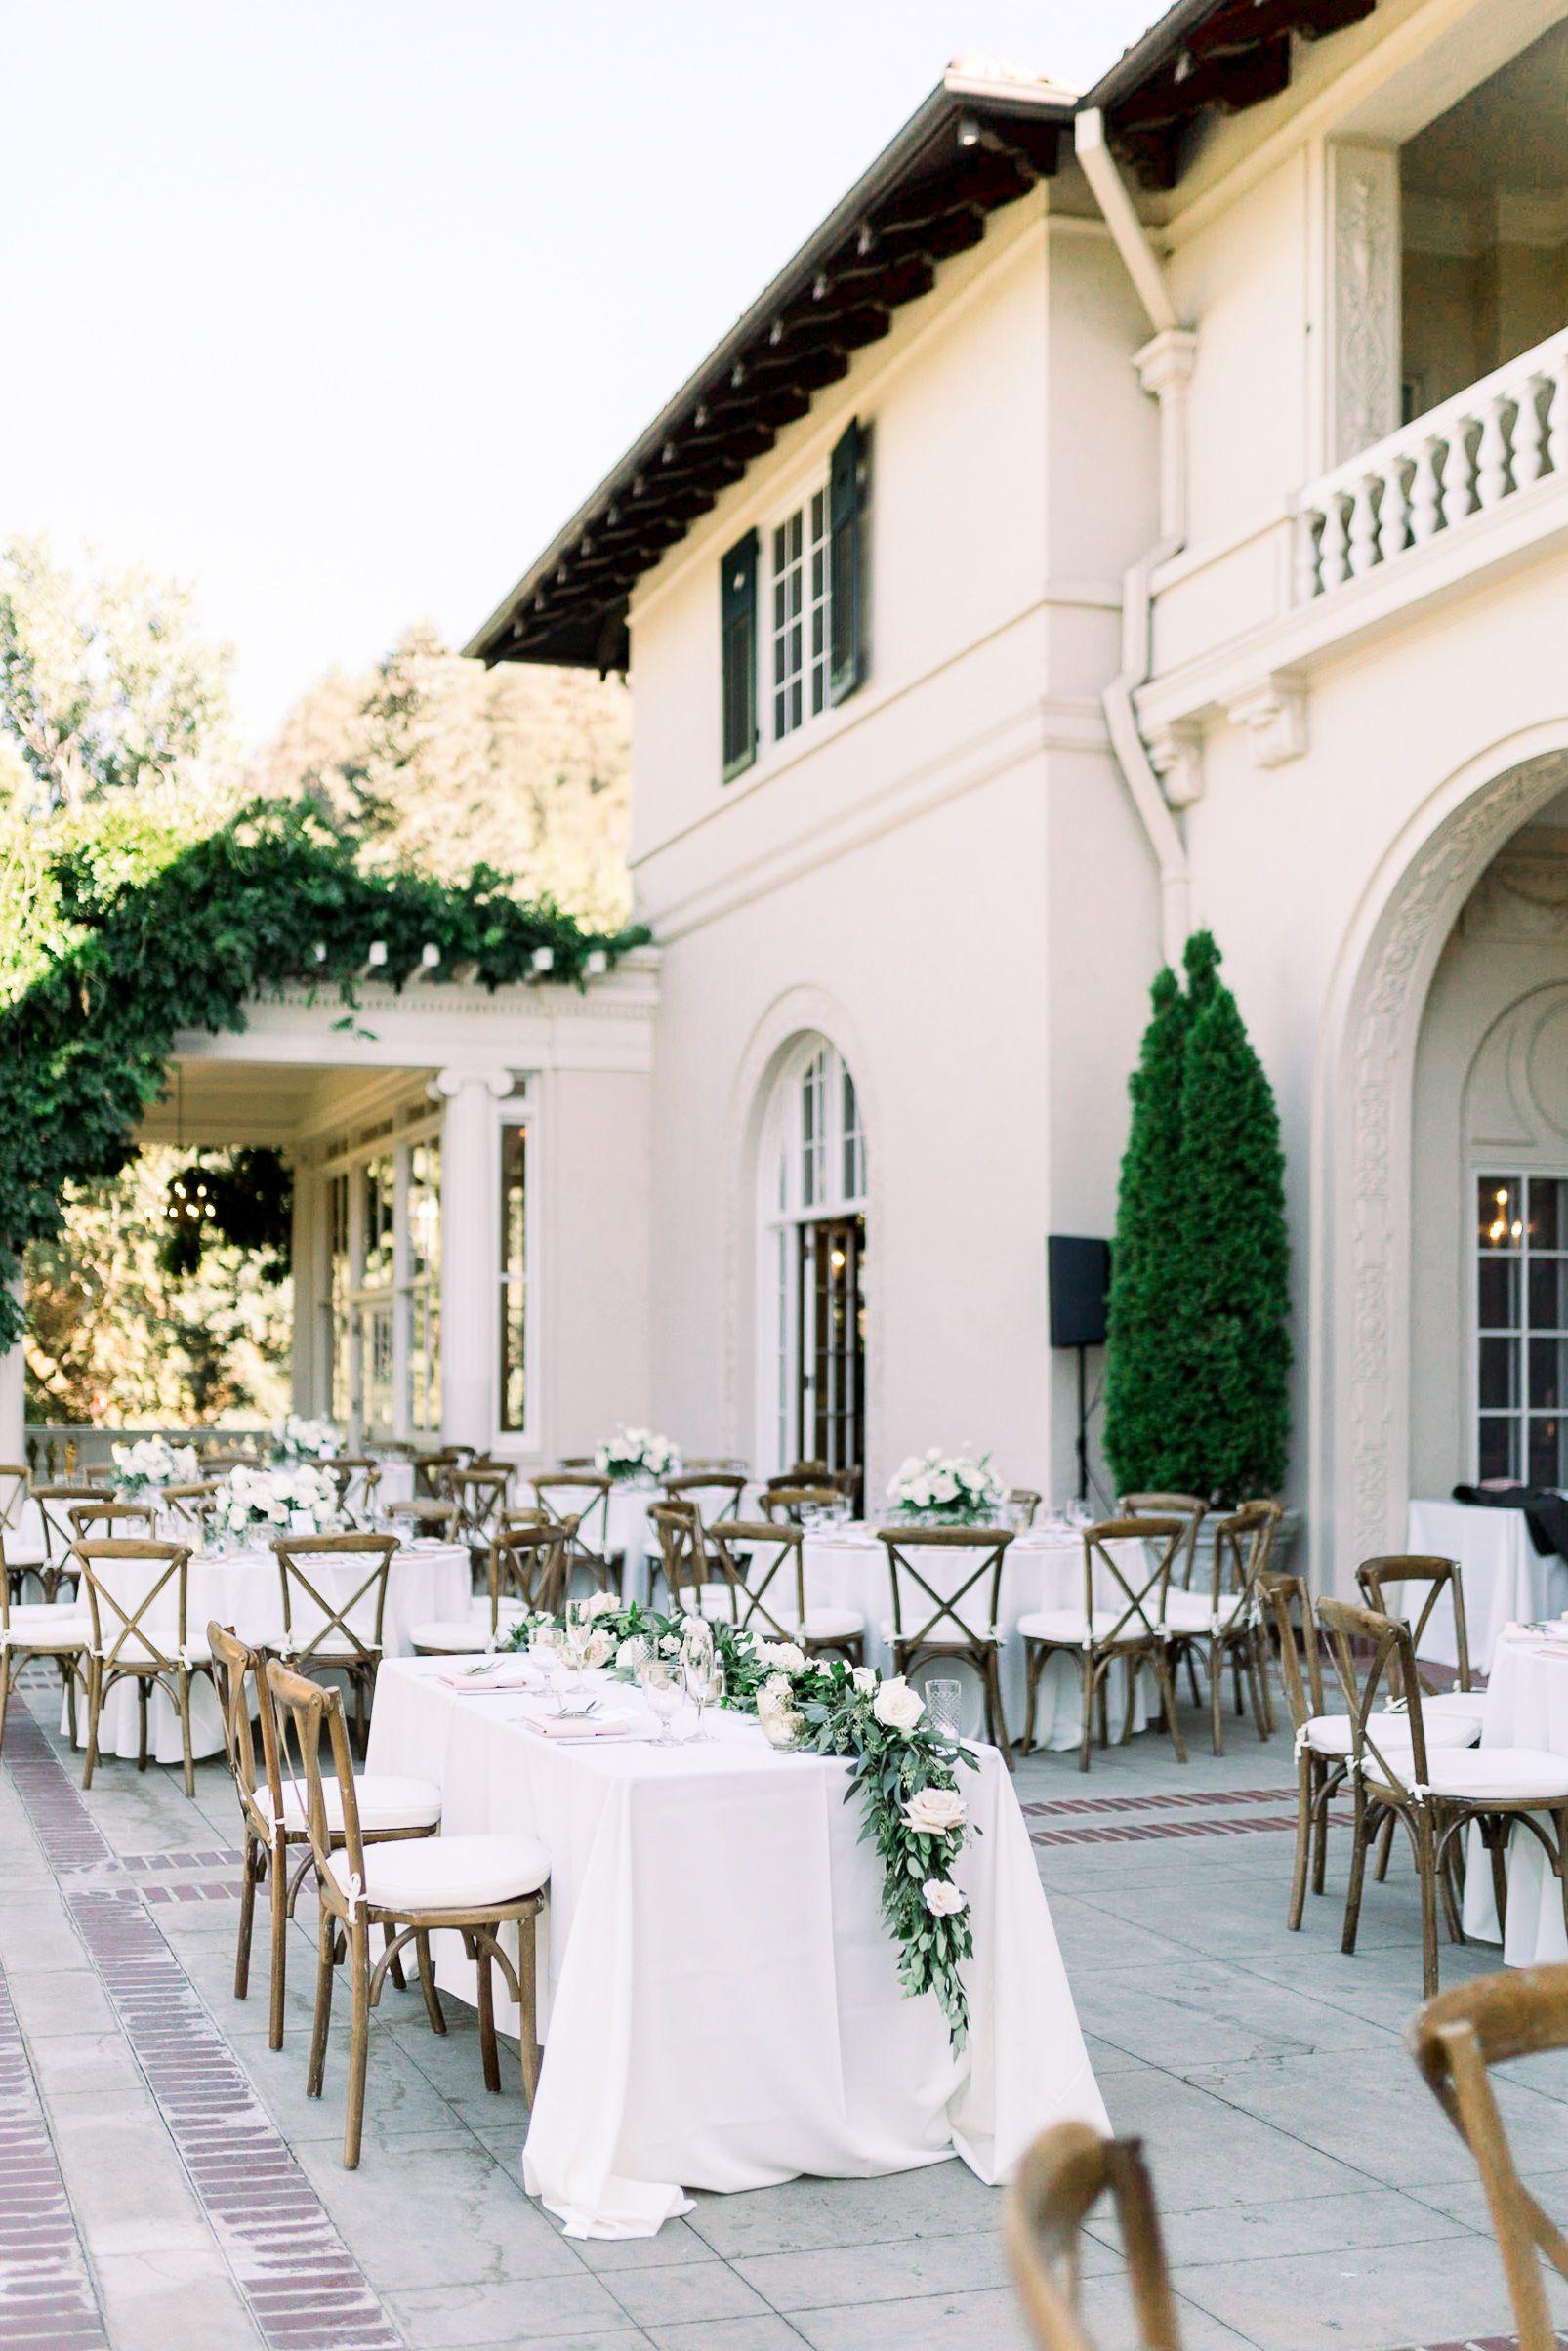 24+ San jose small wedding venues ideas in 2021